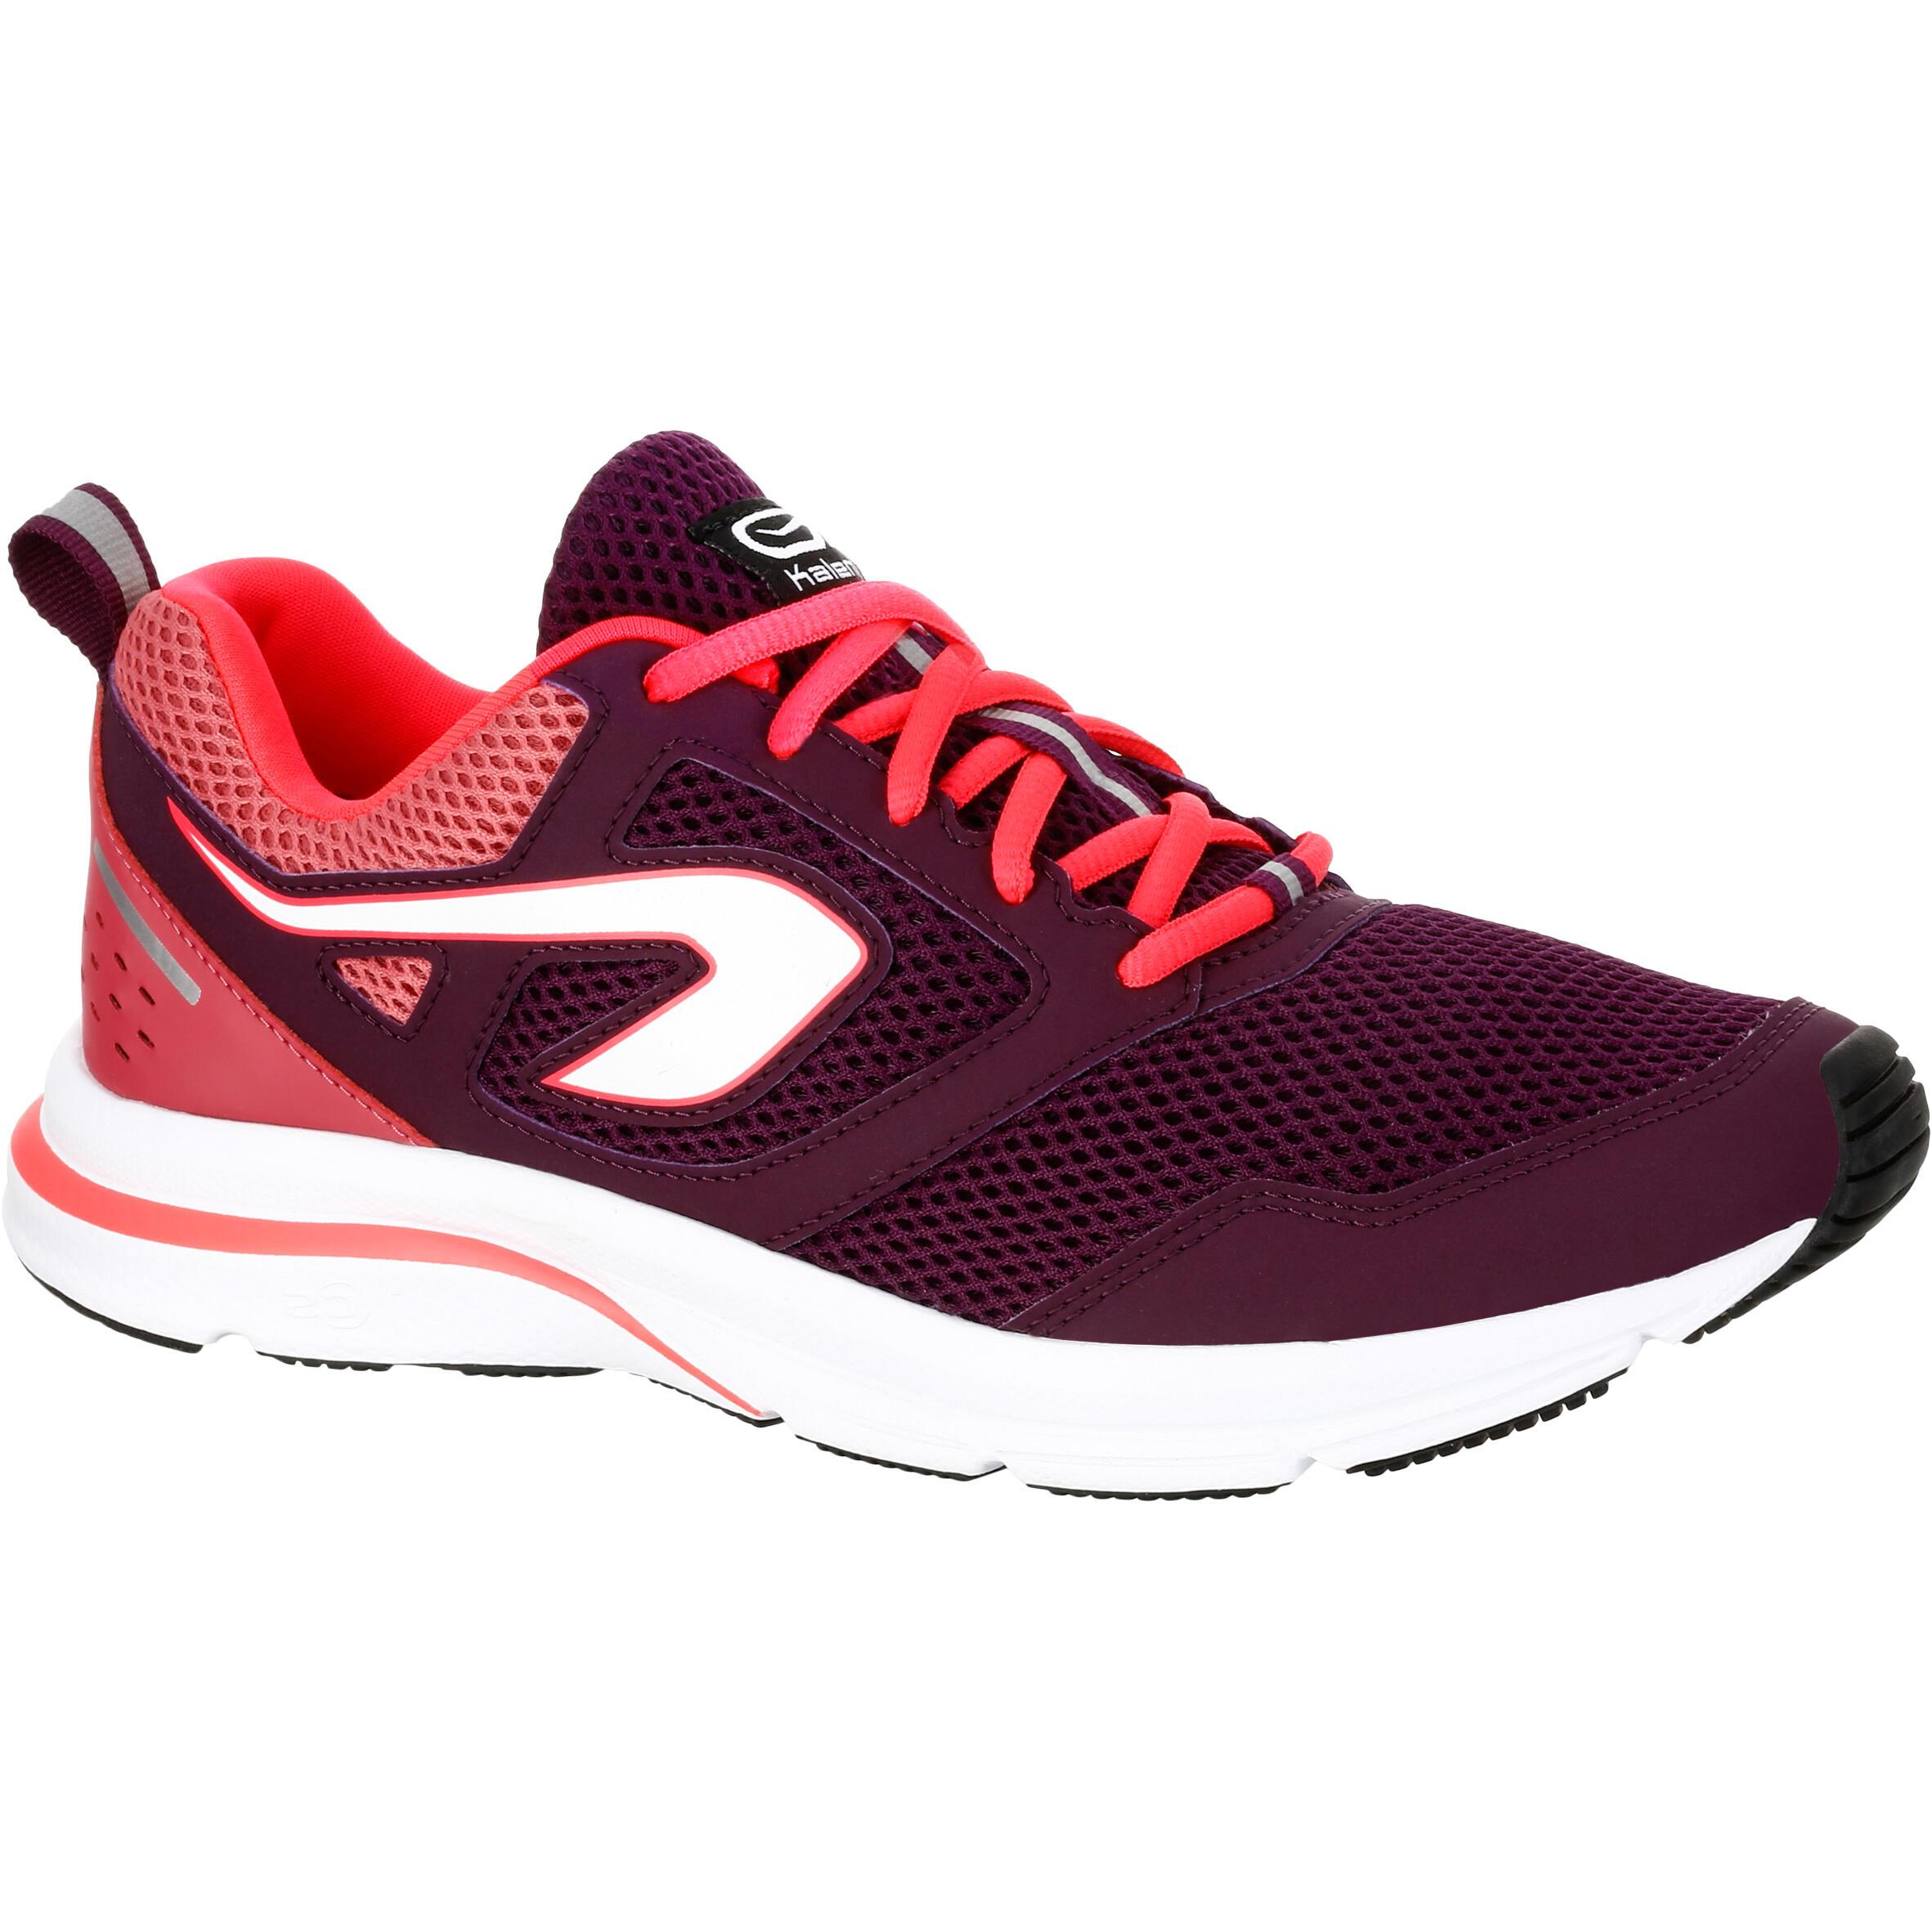 7587ed7c Comprar Zapatillas de Running Mujer Online | Decathlon